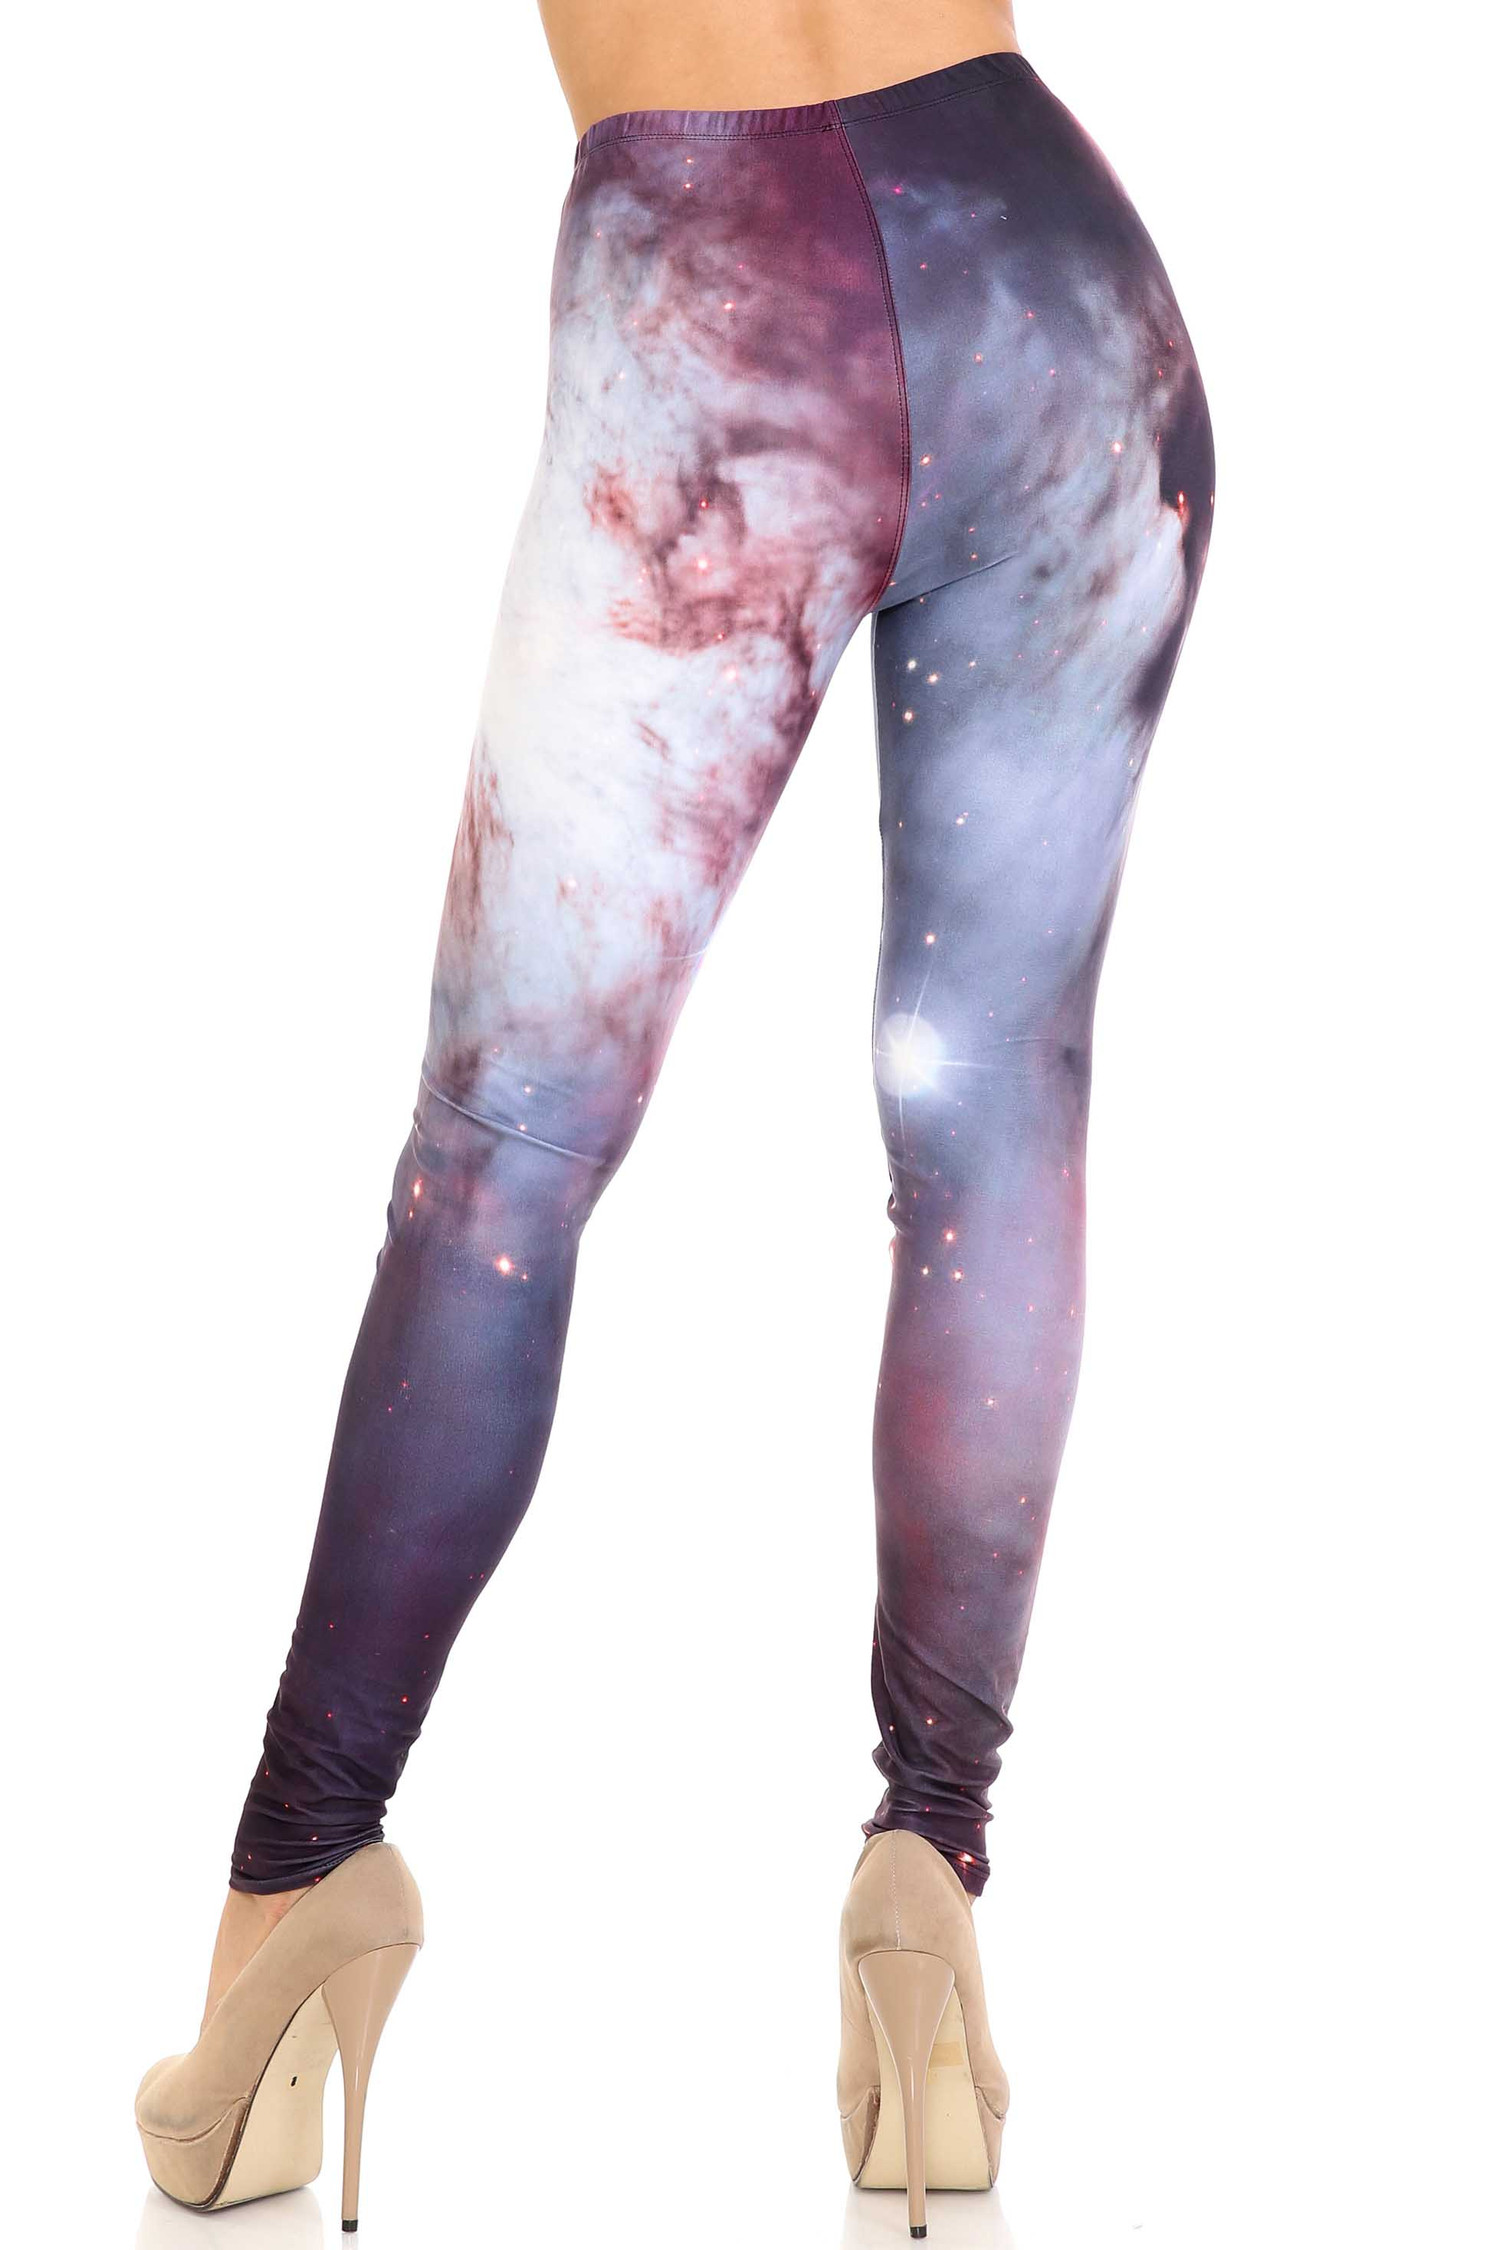 Creamy Soft Black Galaxy Leggings - USA Fashion™